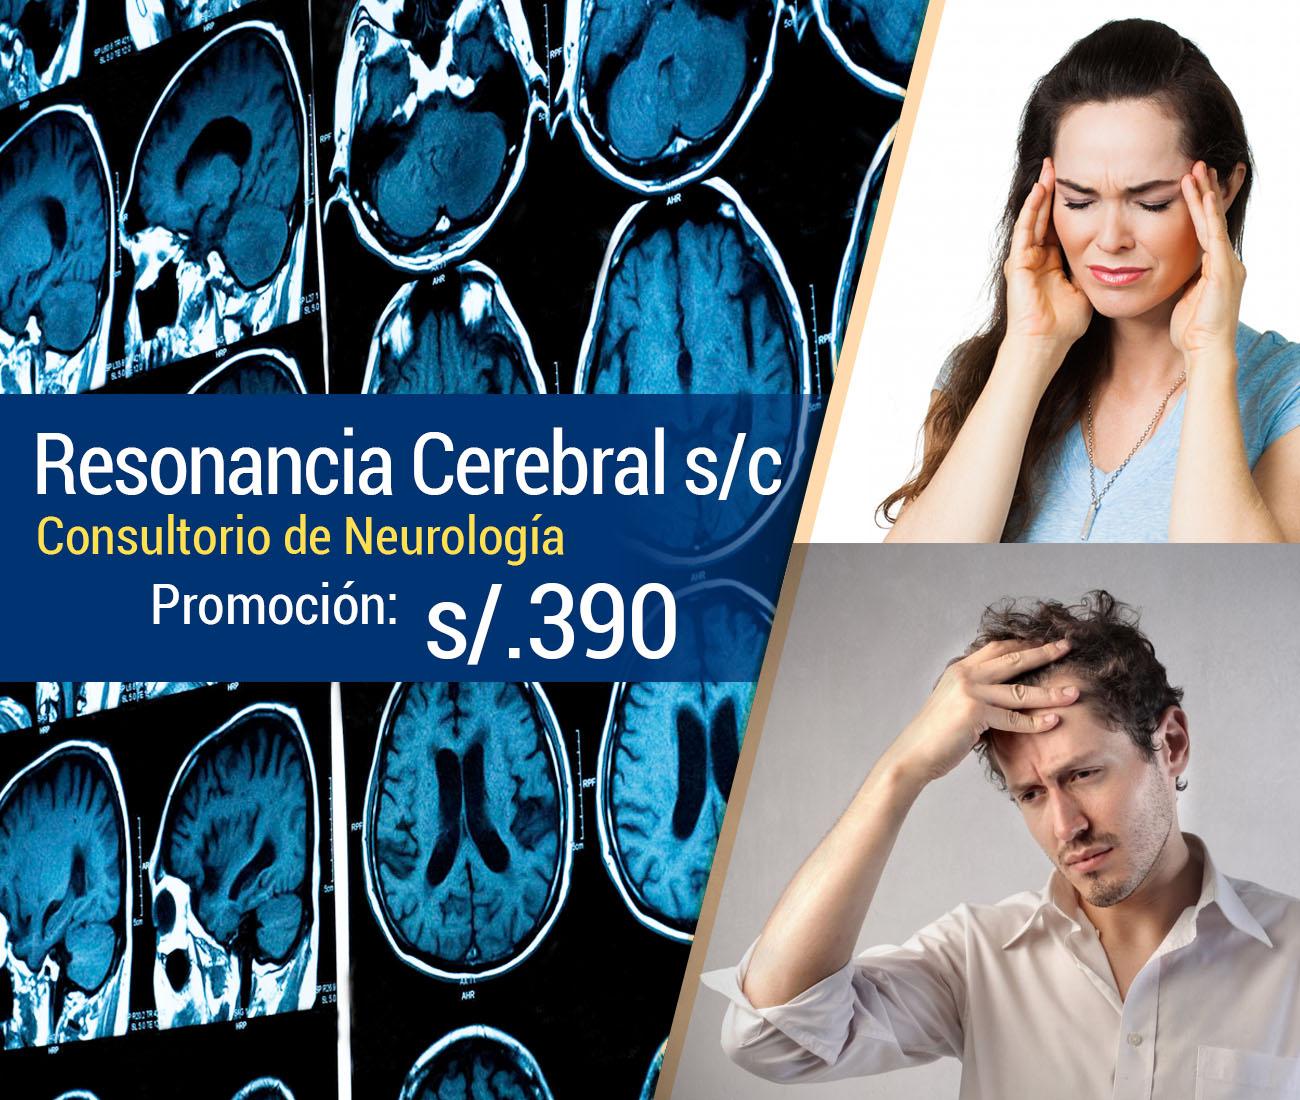 Resonancia Magnética cerebral consultorio neurológico